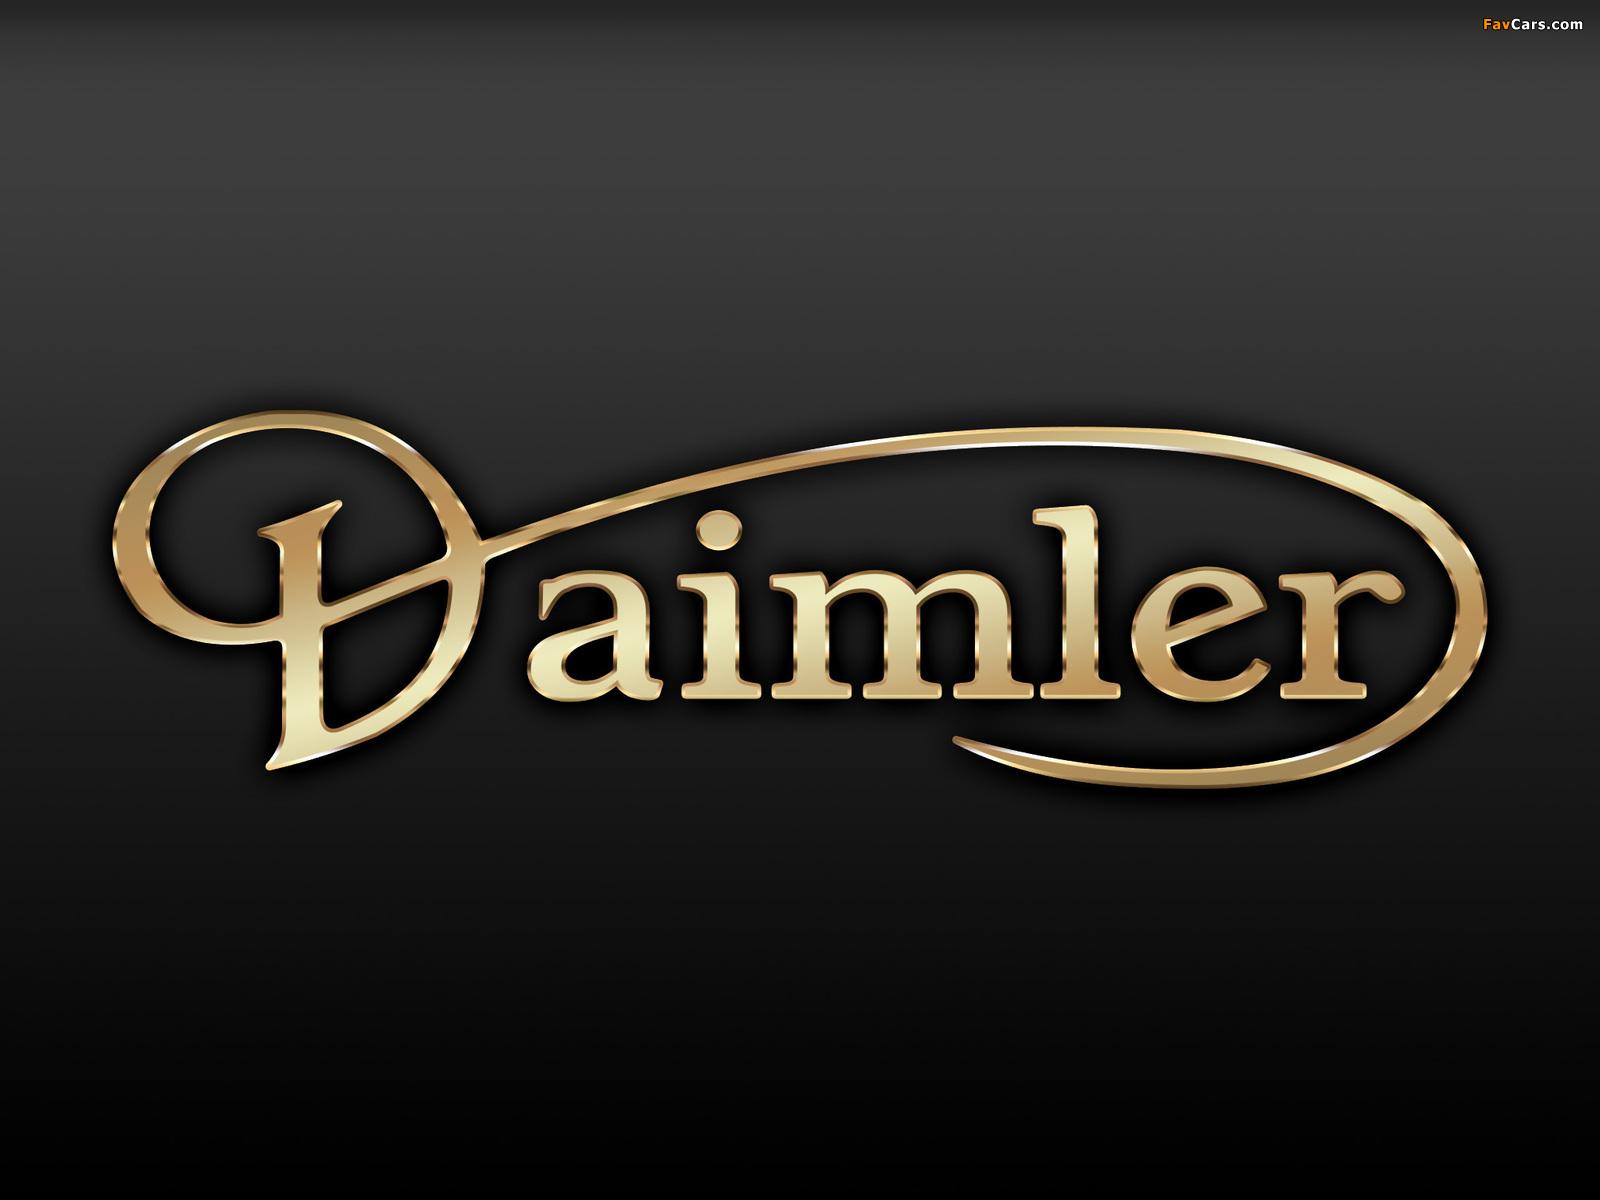 Daimler pictures (1600 x 1200)